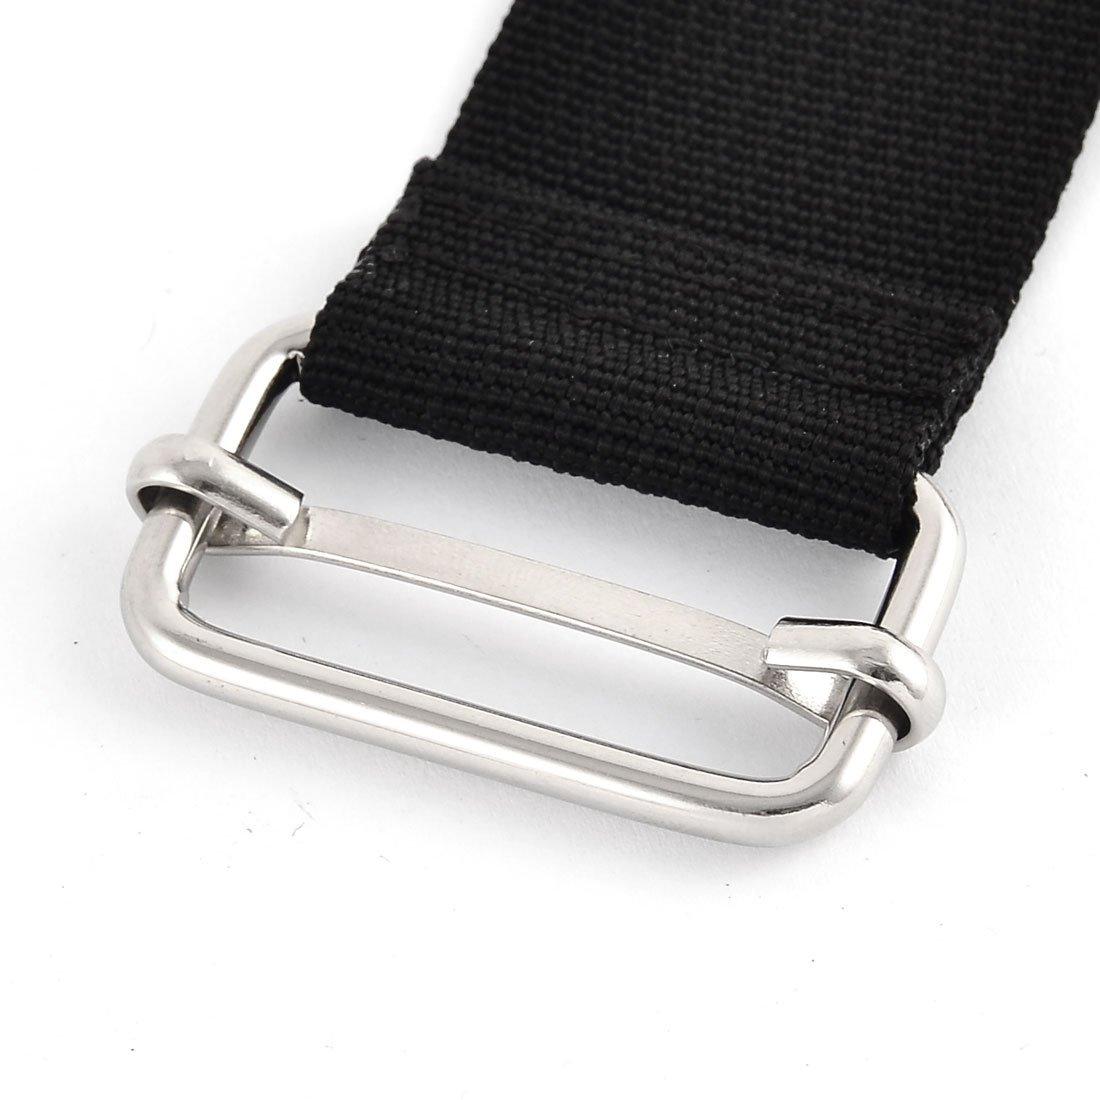 EbuyChX Naylon Home Travel Adjustable Suitcase Bagahe strap belt buckle 3.8 x 50cm Black